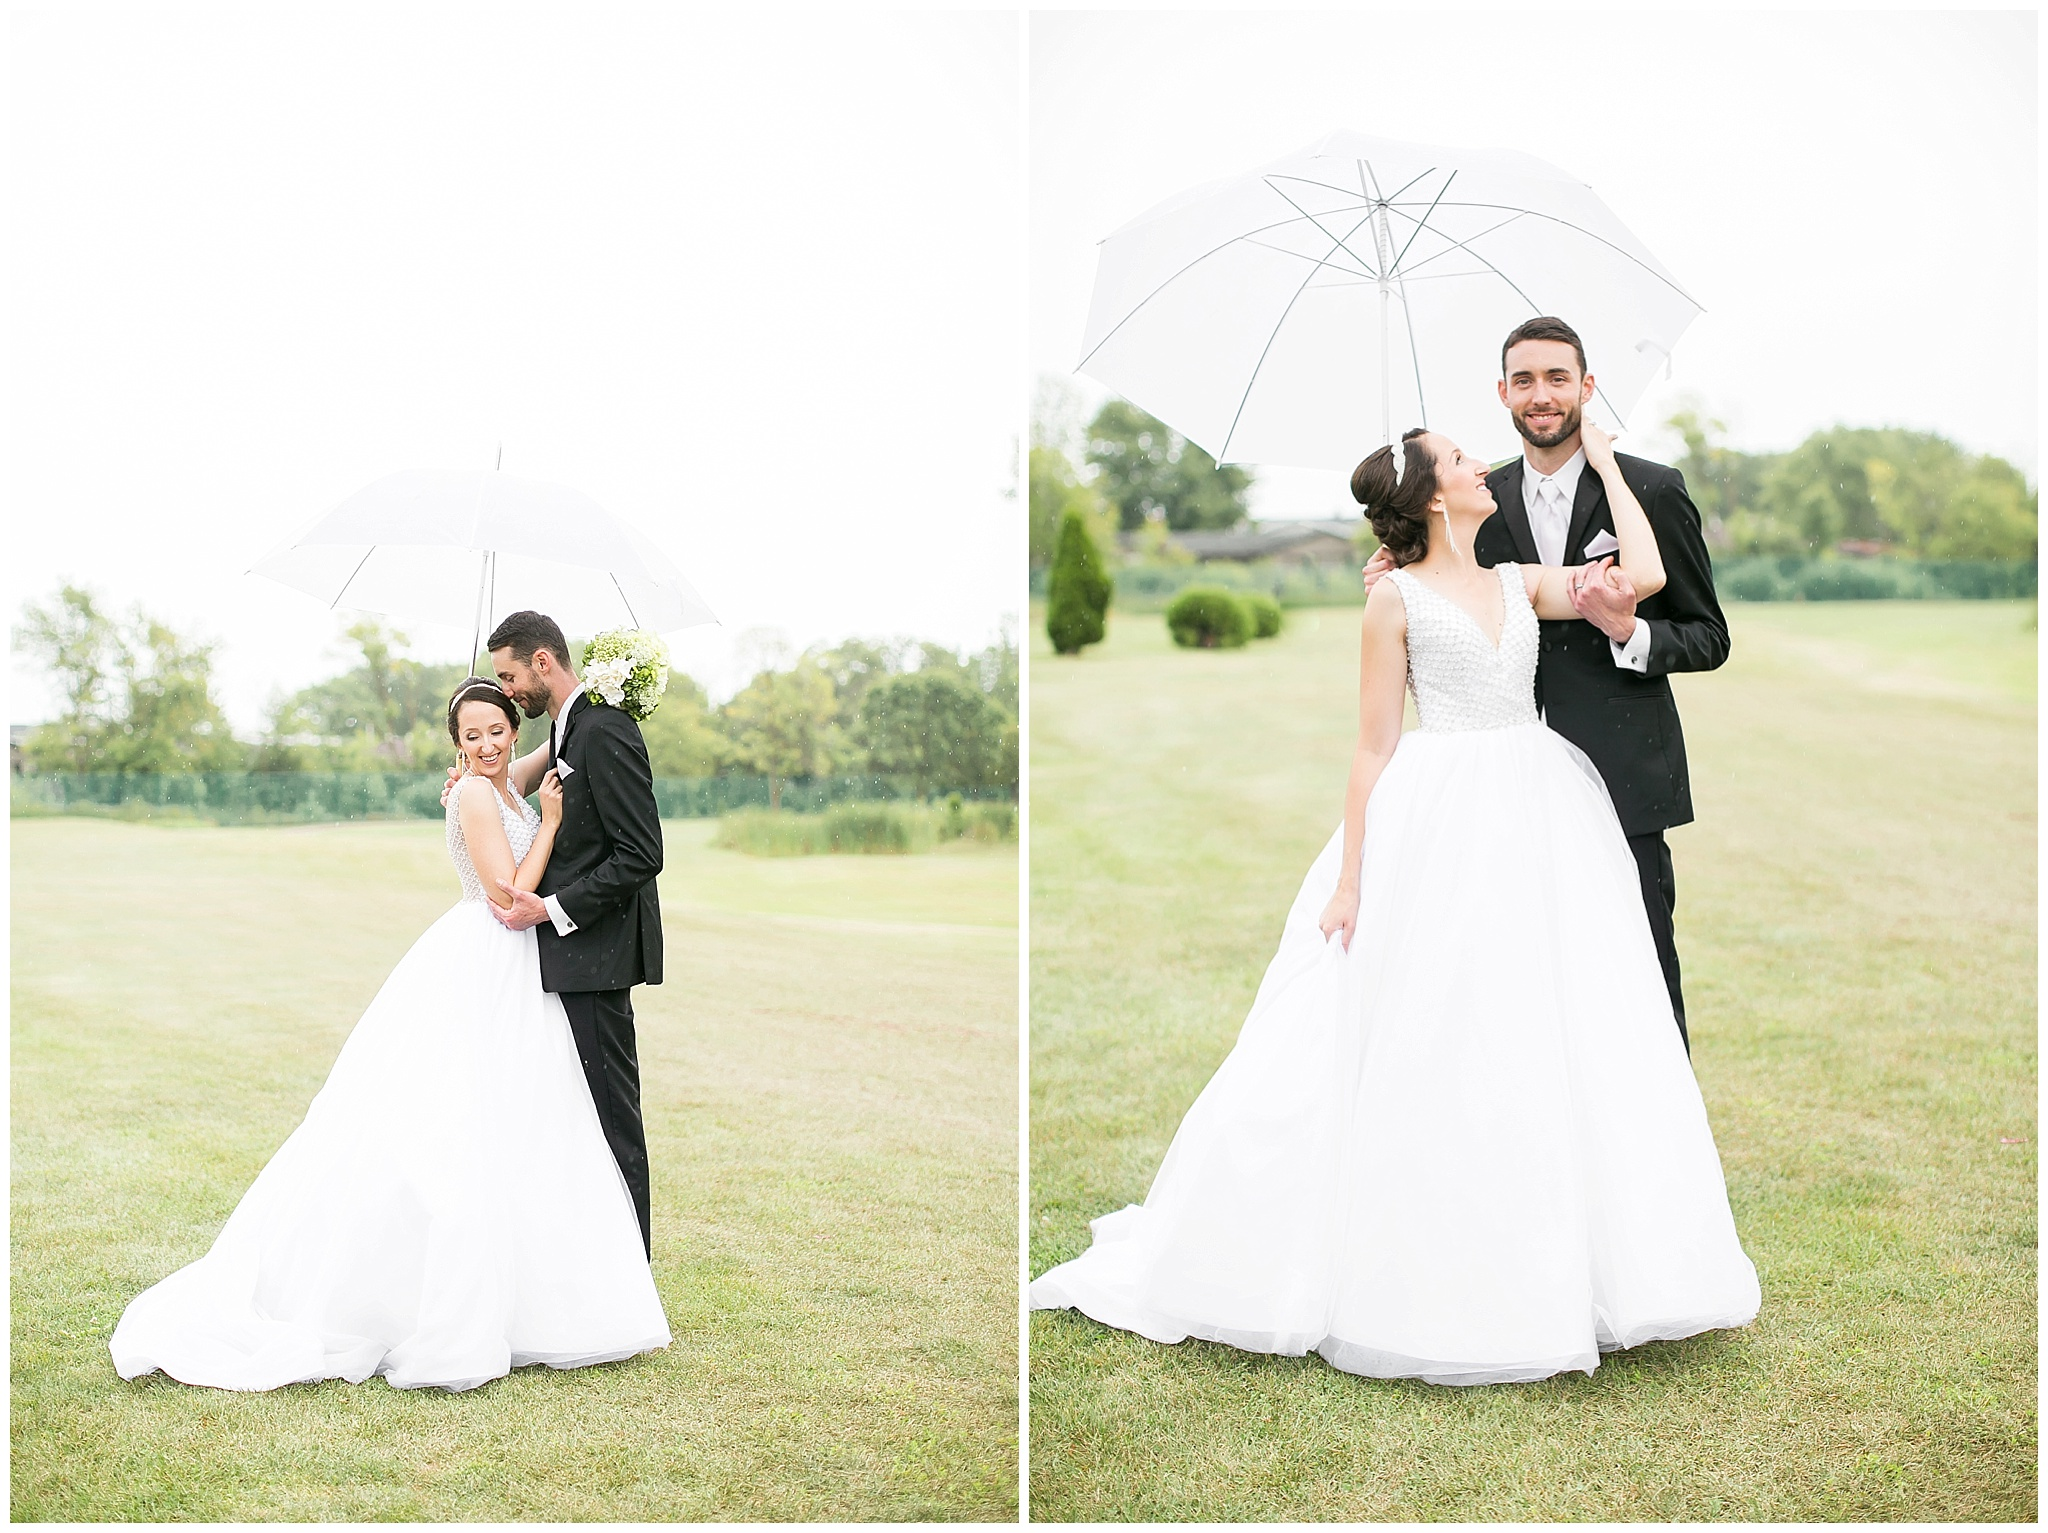 bridgewood_resort_wedding_neenah_wisconsin_0331.jpg